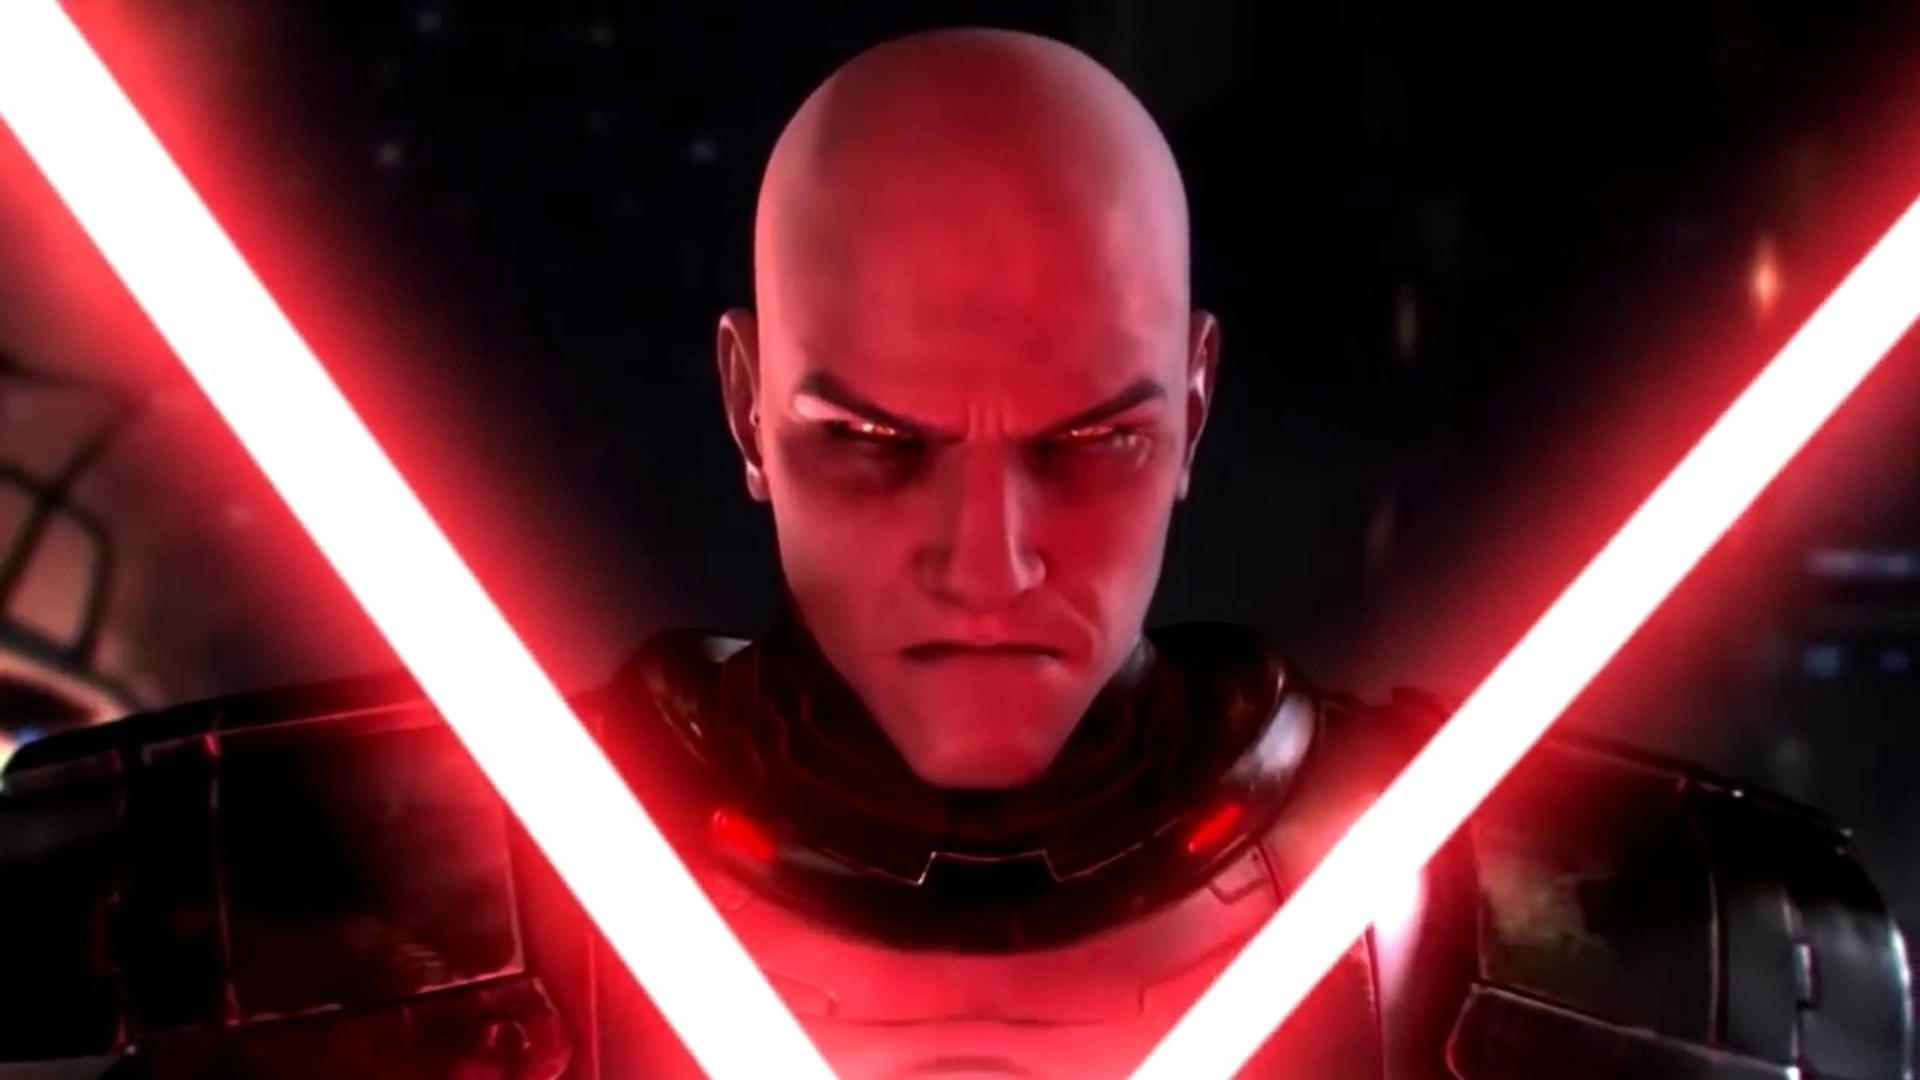 Star Wars The Jedi vs Darth Vader HD Superhero Movies - Part 1